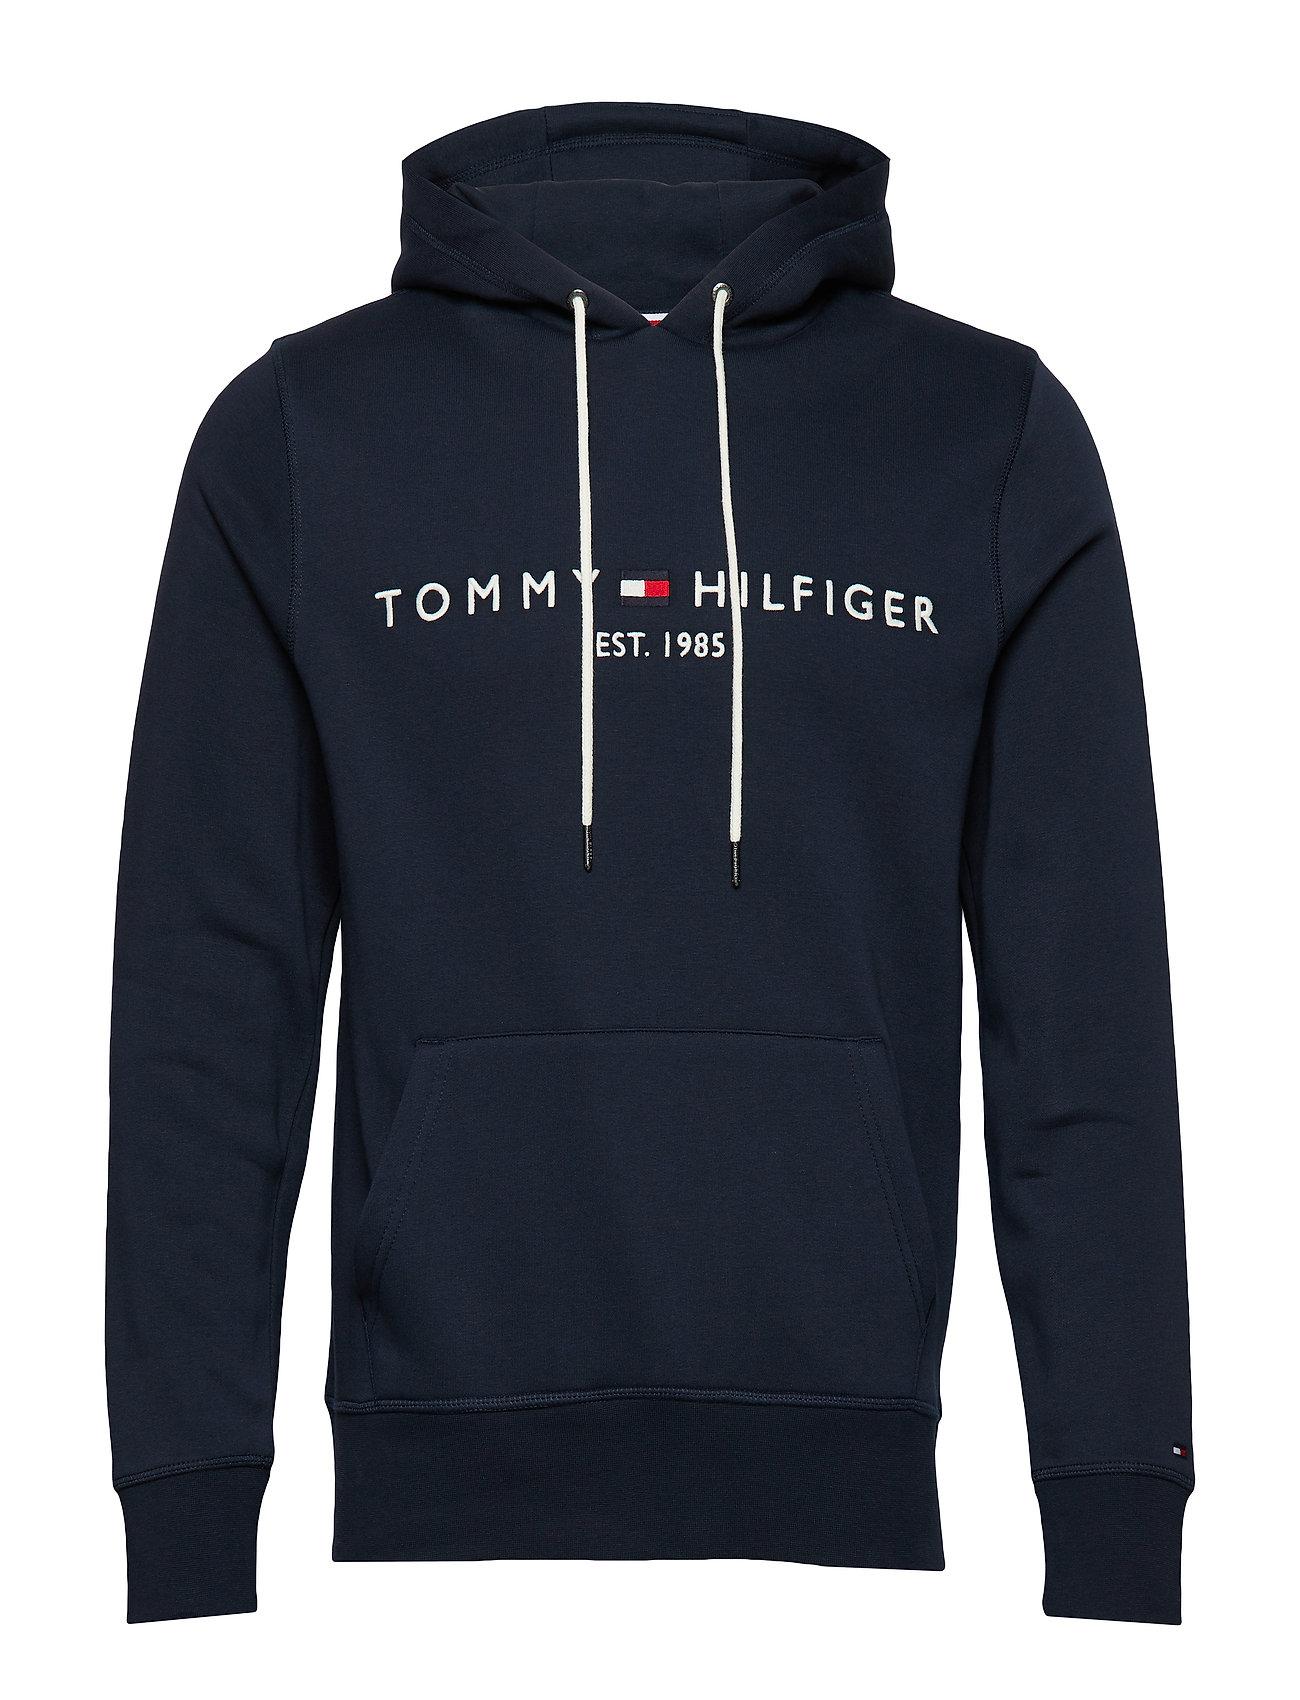 Tommy Hilfiger TOMMY LOGO HOODY - SKY CAPTAIN